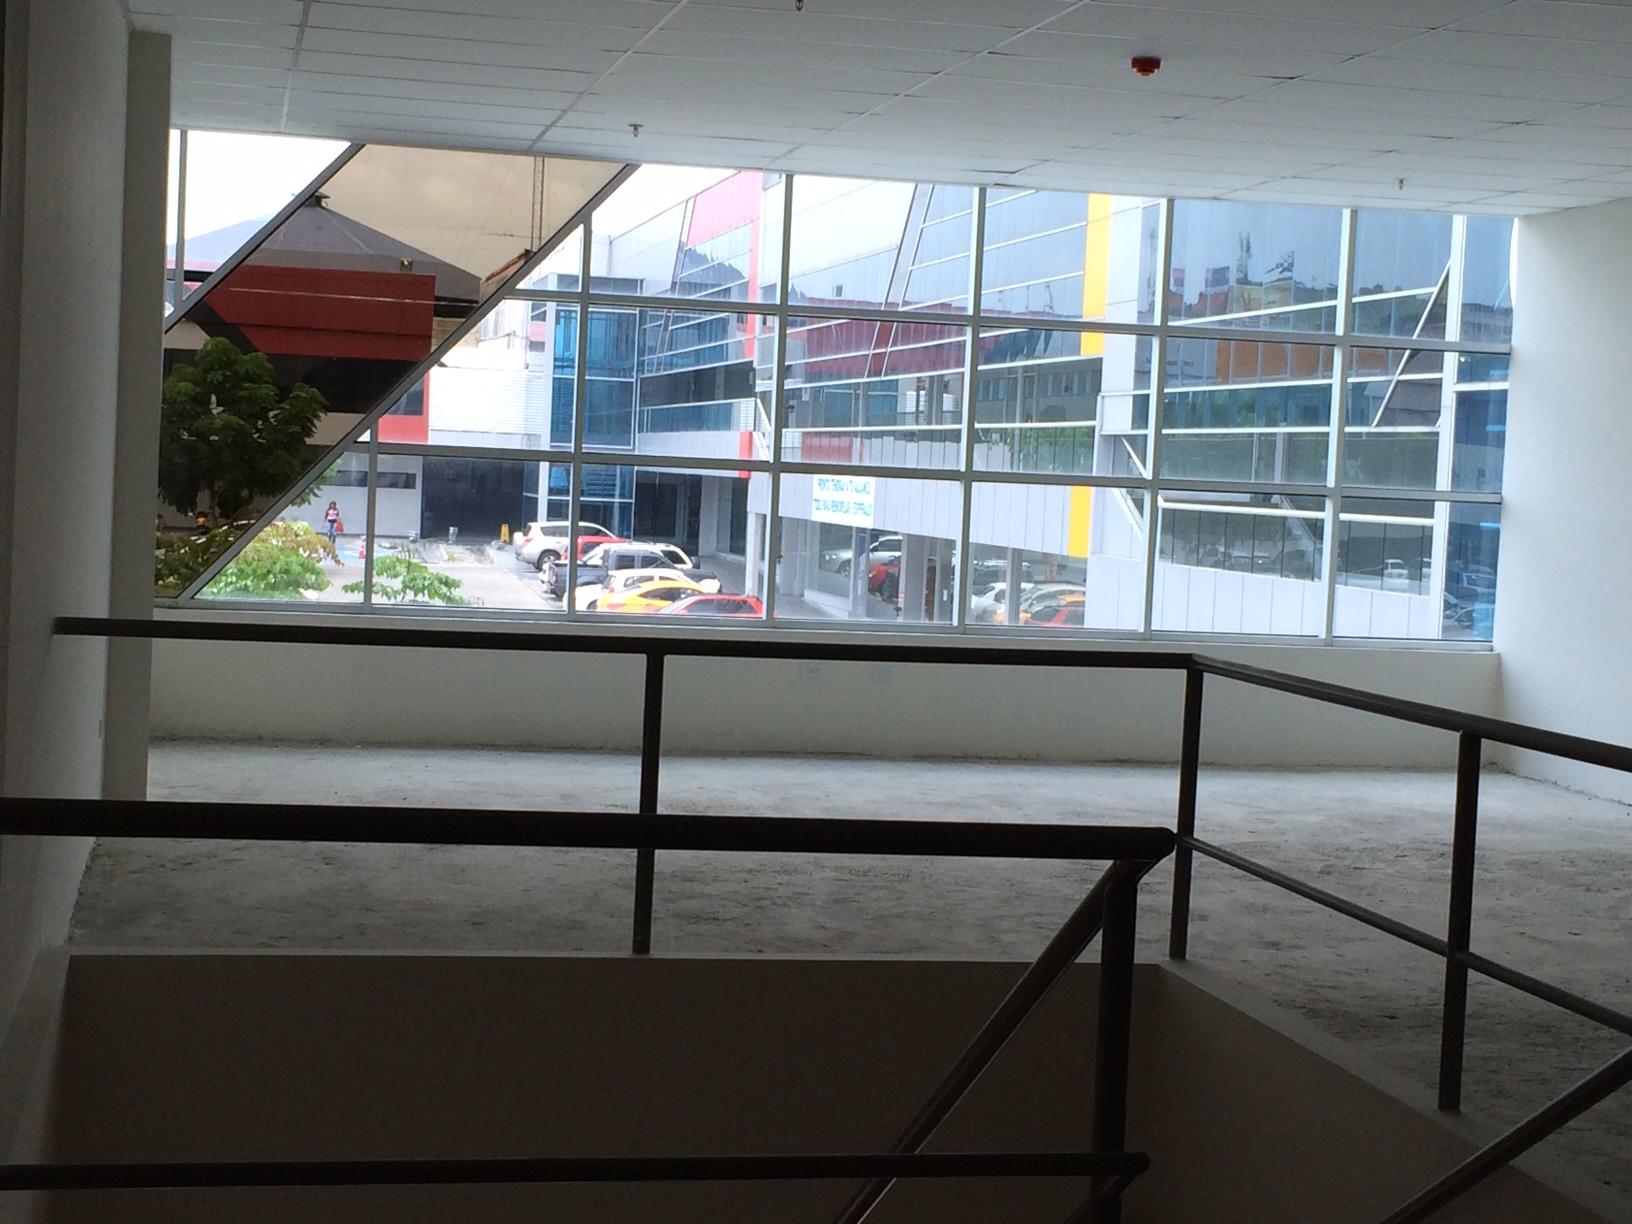 PANAMA, TOCUMEN, COMMERCIAL SPACE IN PLAZA CONQUISTADOR